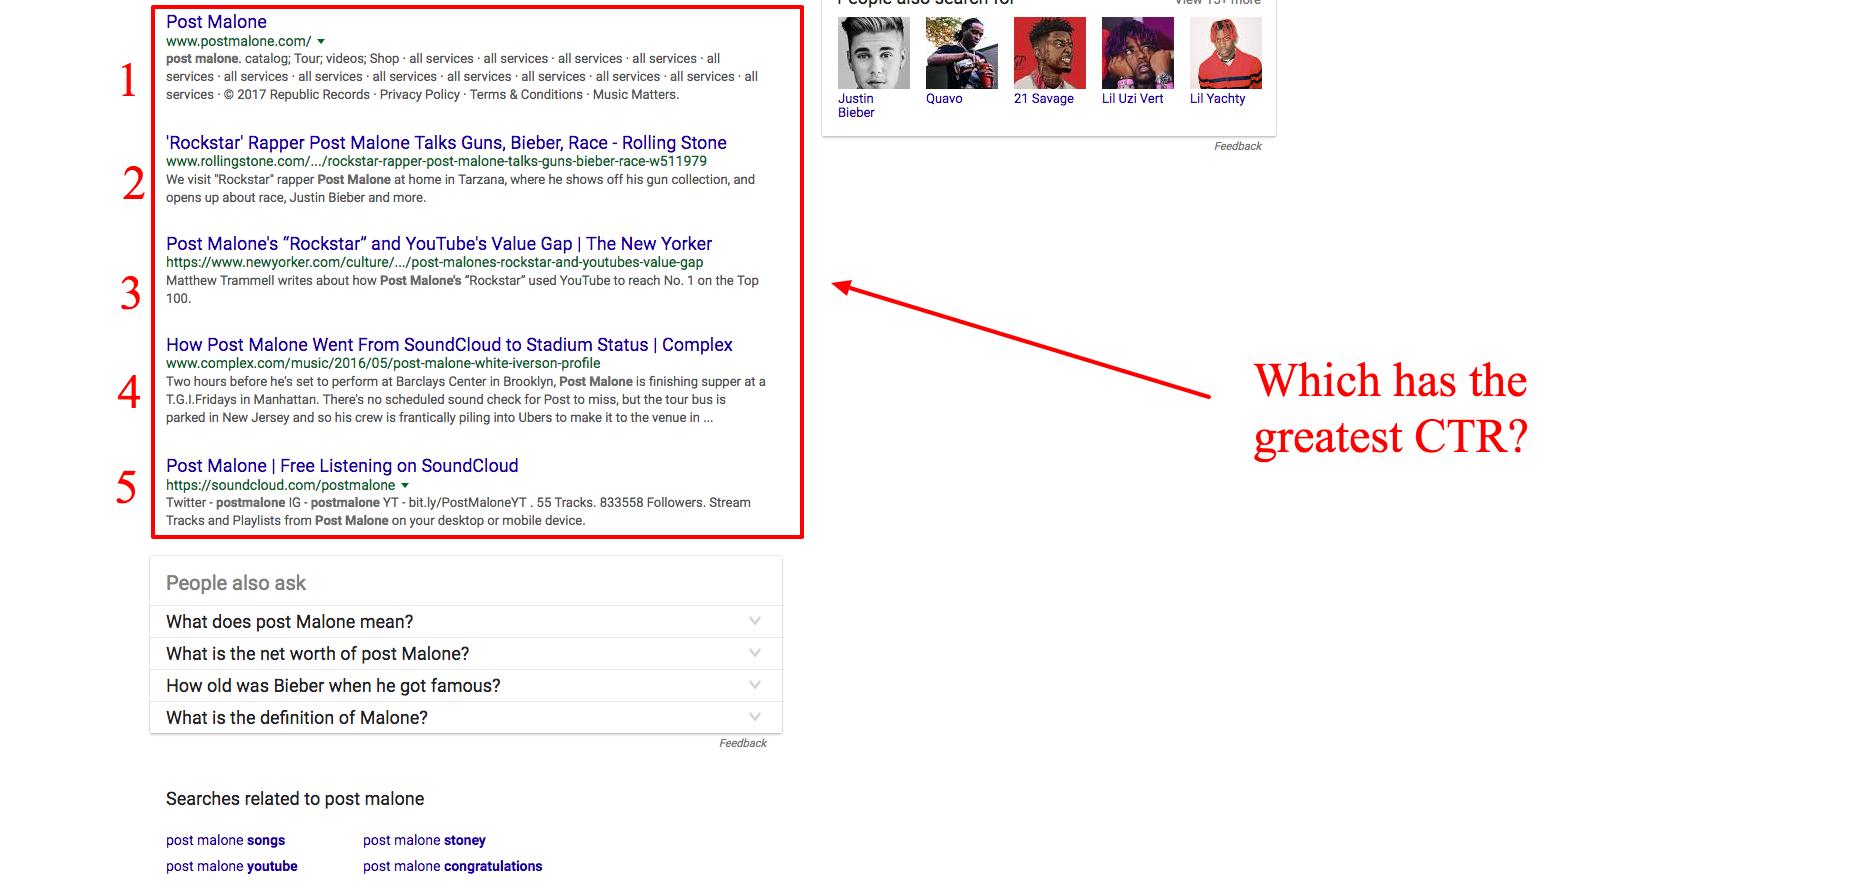 Google Search Hack For Increasing Organic CTR & Keyword Traffic   Ezoic